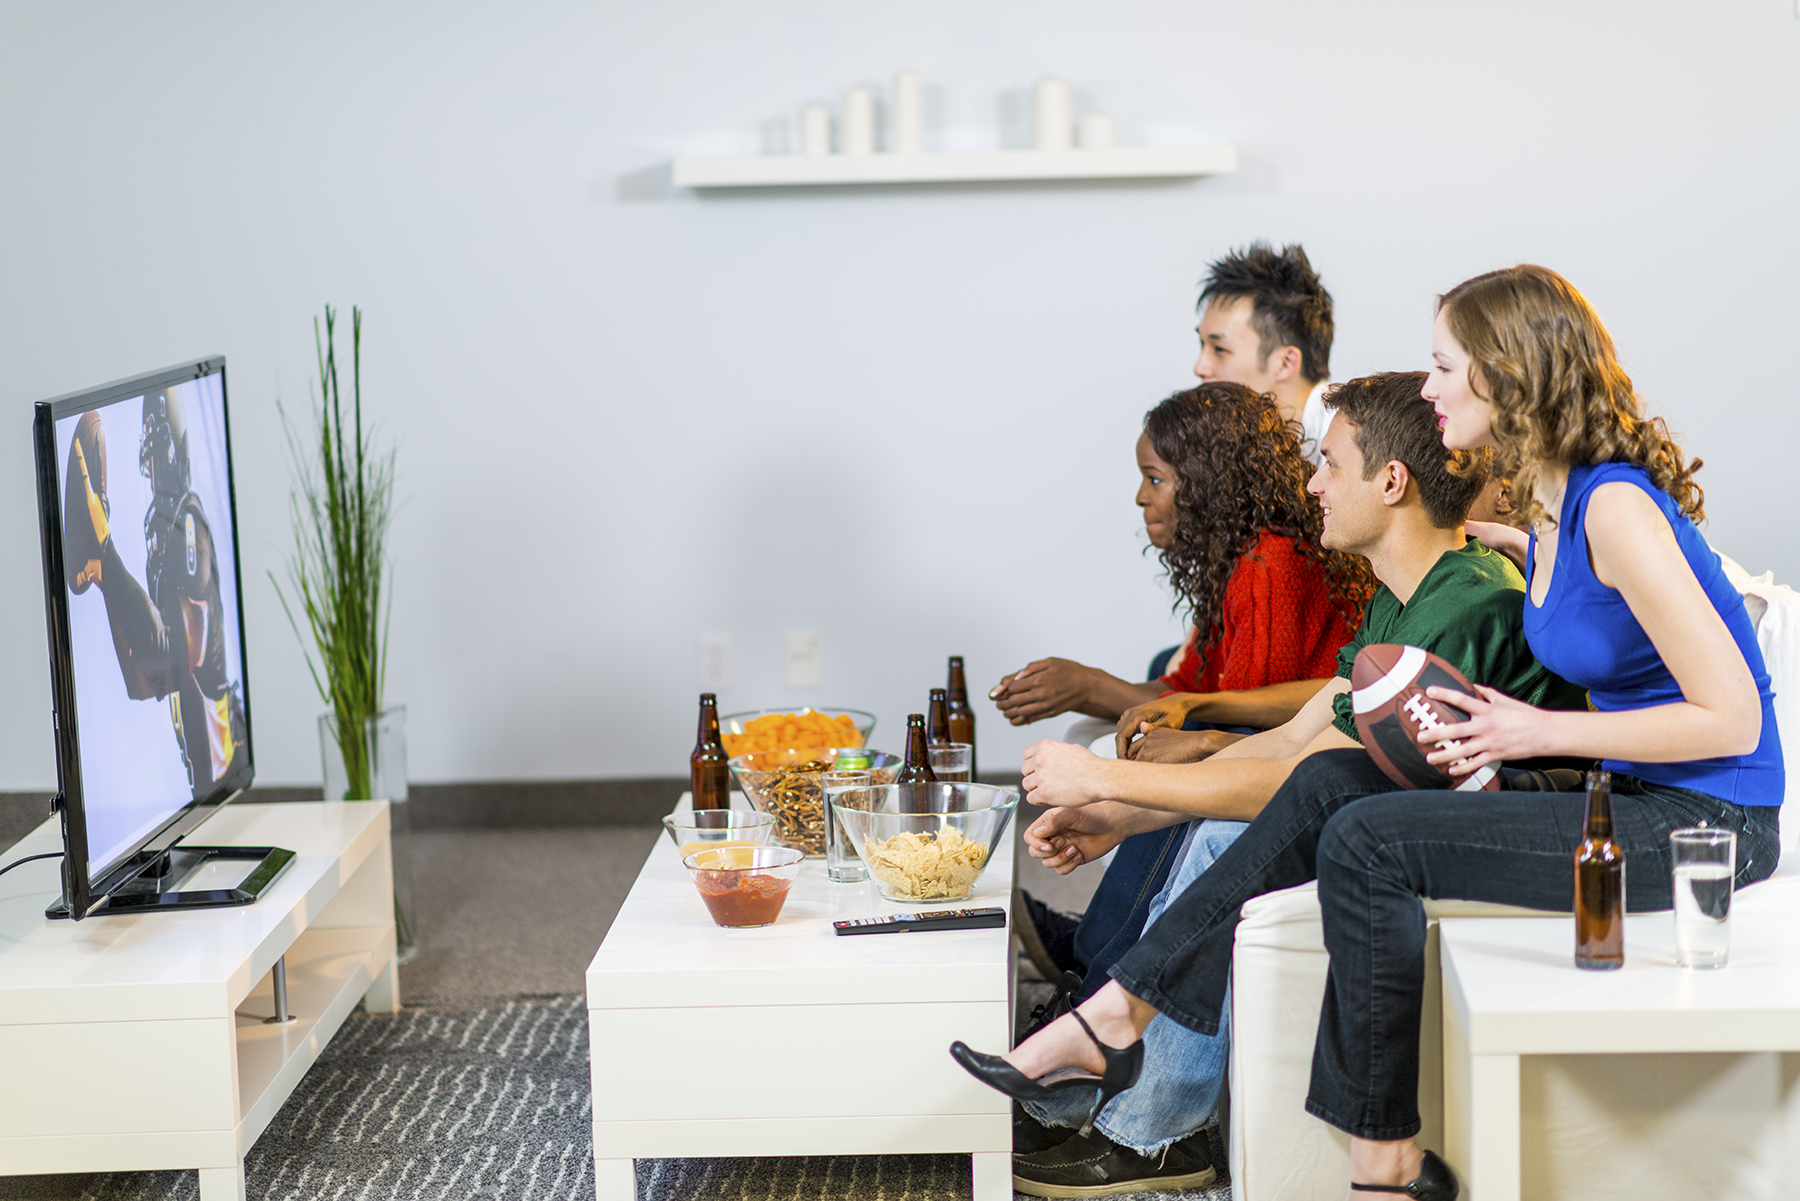 Friends Watching